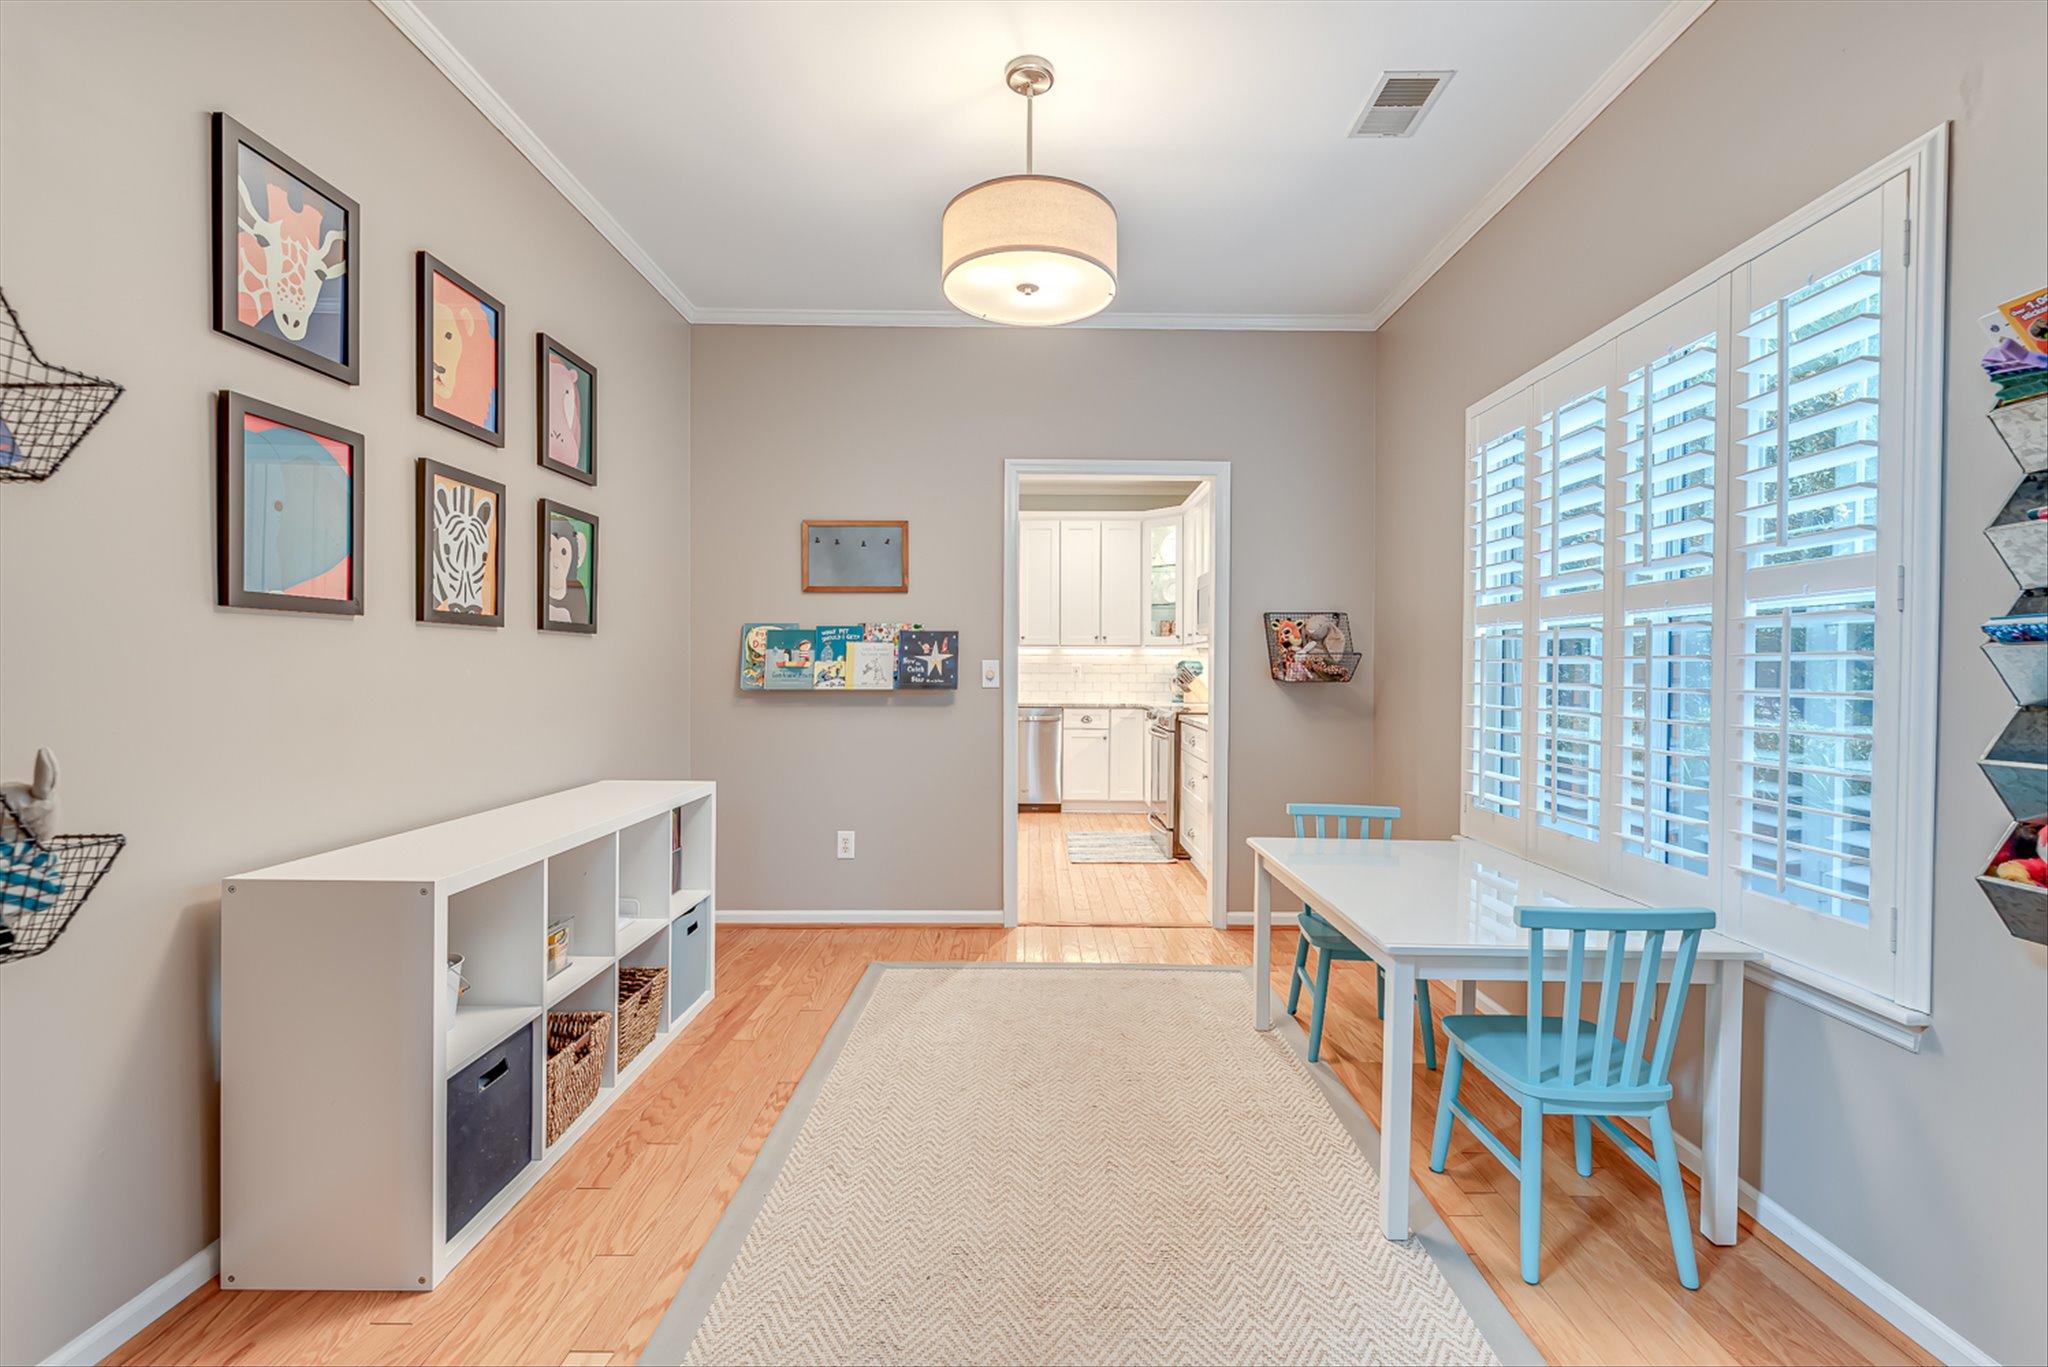 Belle Hall Homes For Sale - 278 Jardinere, Mount Pleasant, SC - 22